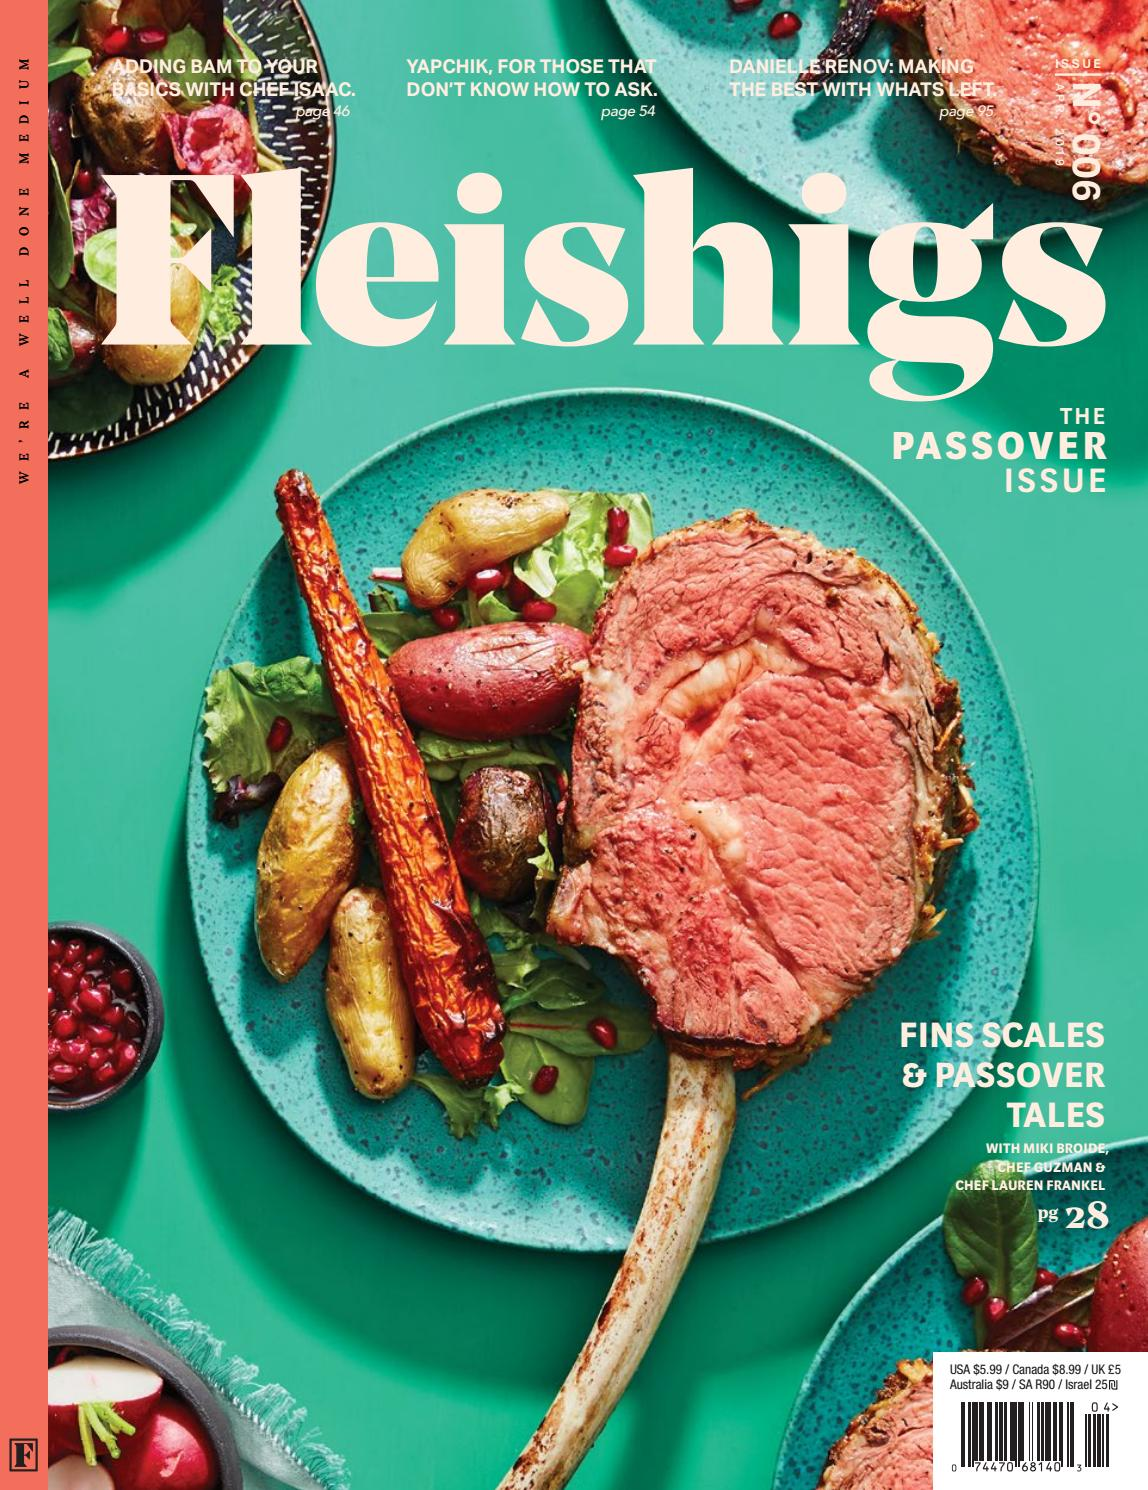 Fleishigs Magazine Issue 006 - April 2019 by Fleishigs